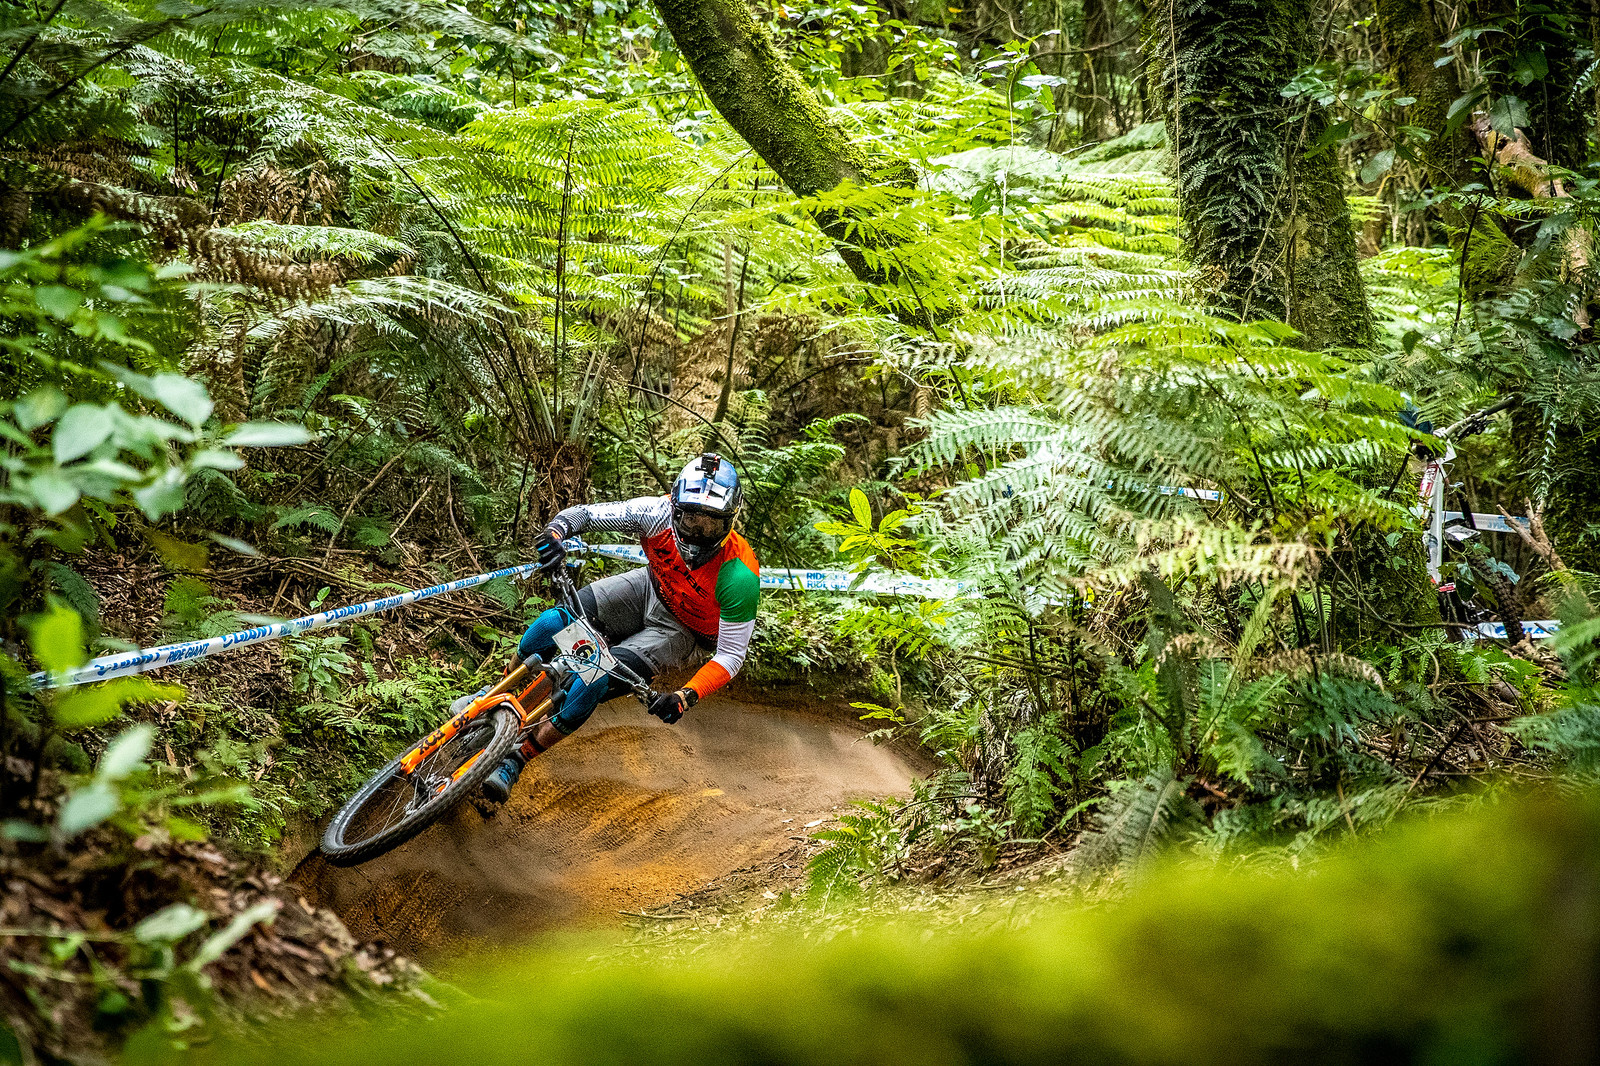 Greg Callaghan - 2019 Enduro World Series Crankworx Rotorua - Mountain Biking Pictures - Vital MTB